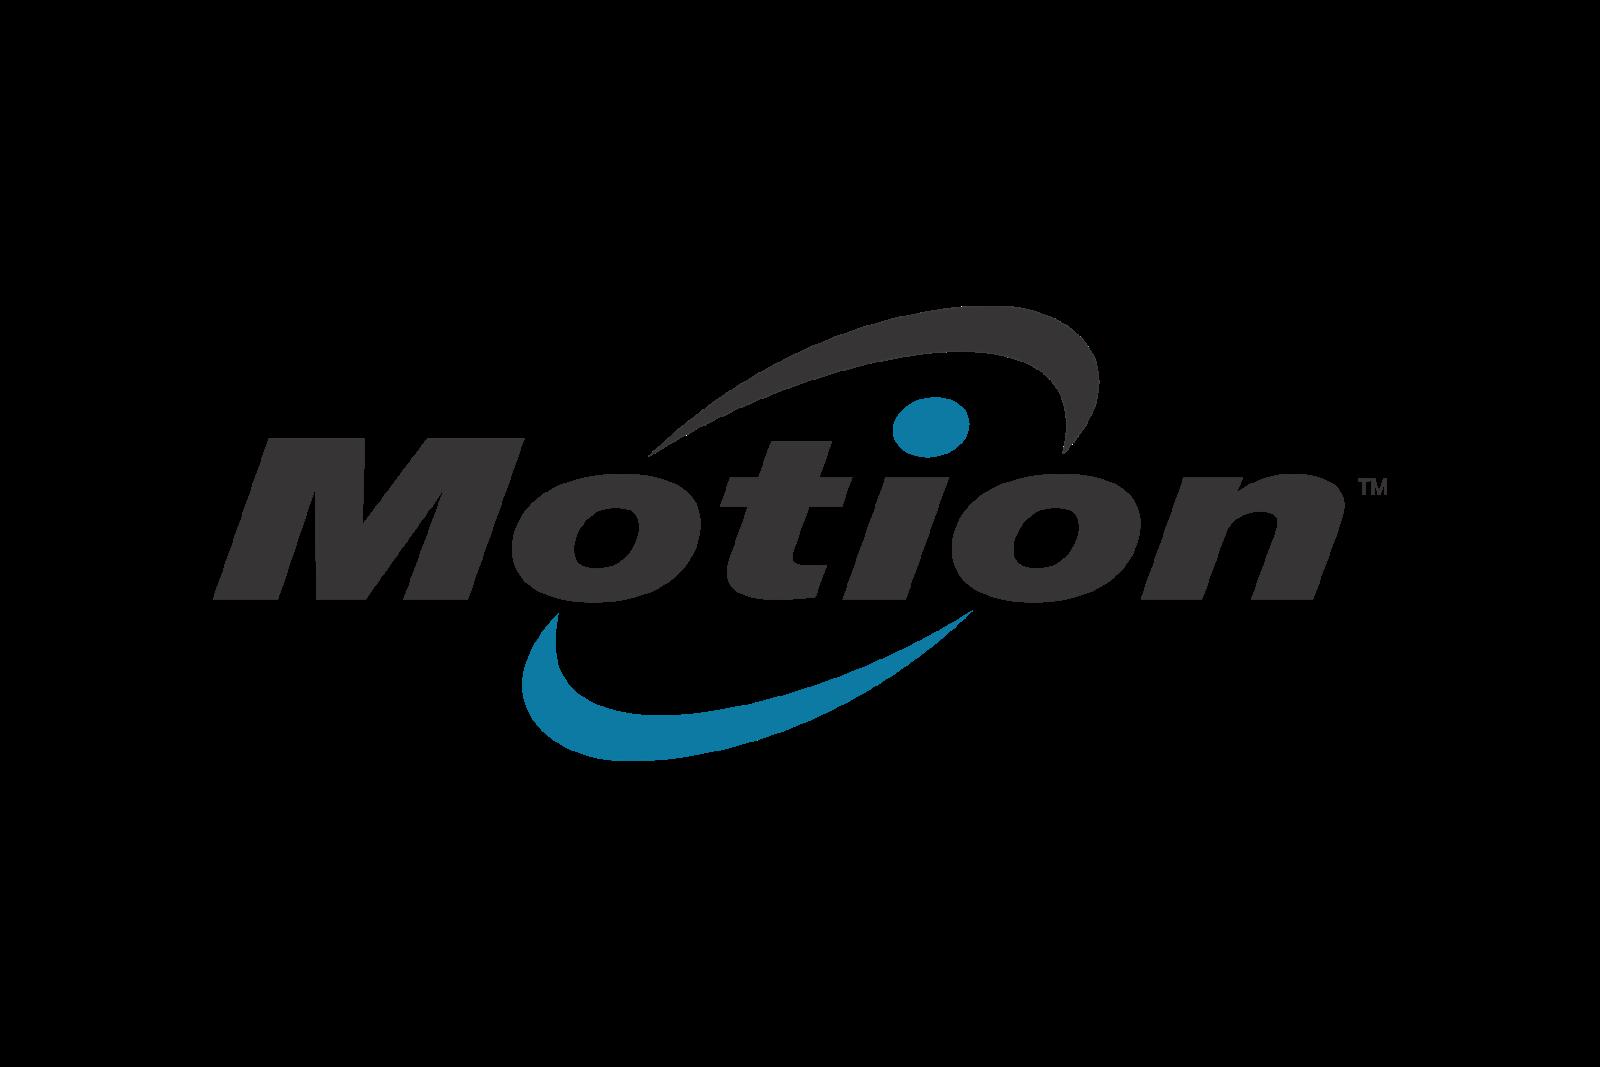 motion computing logo